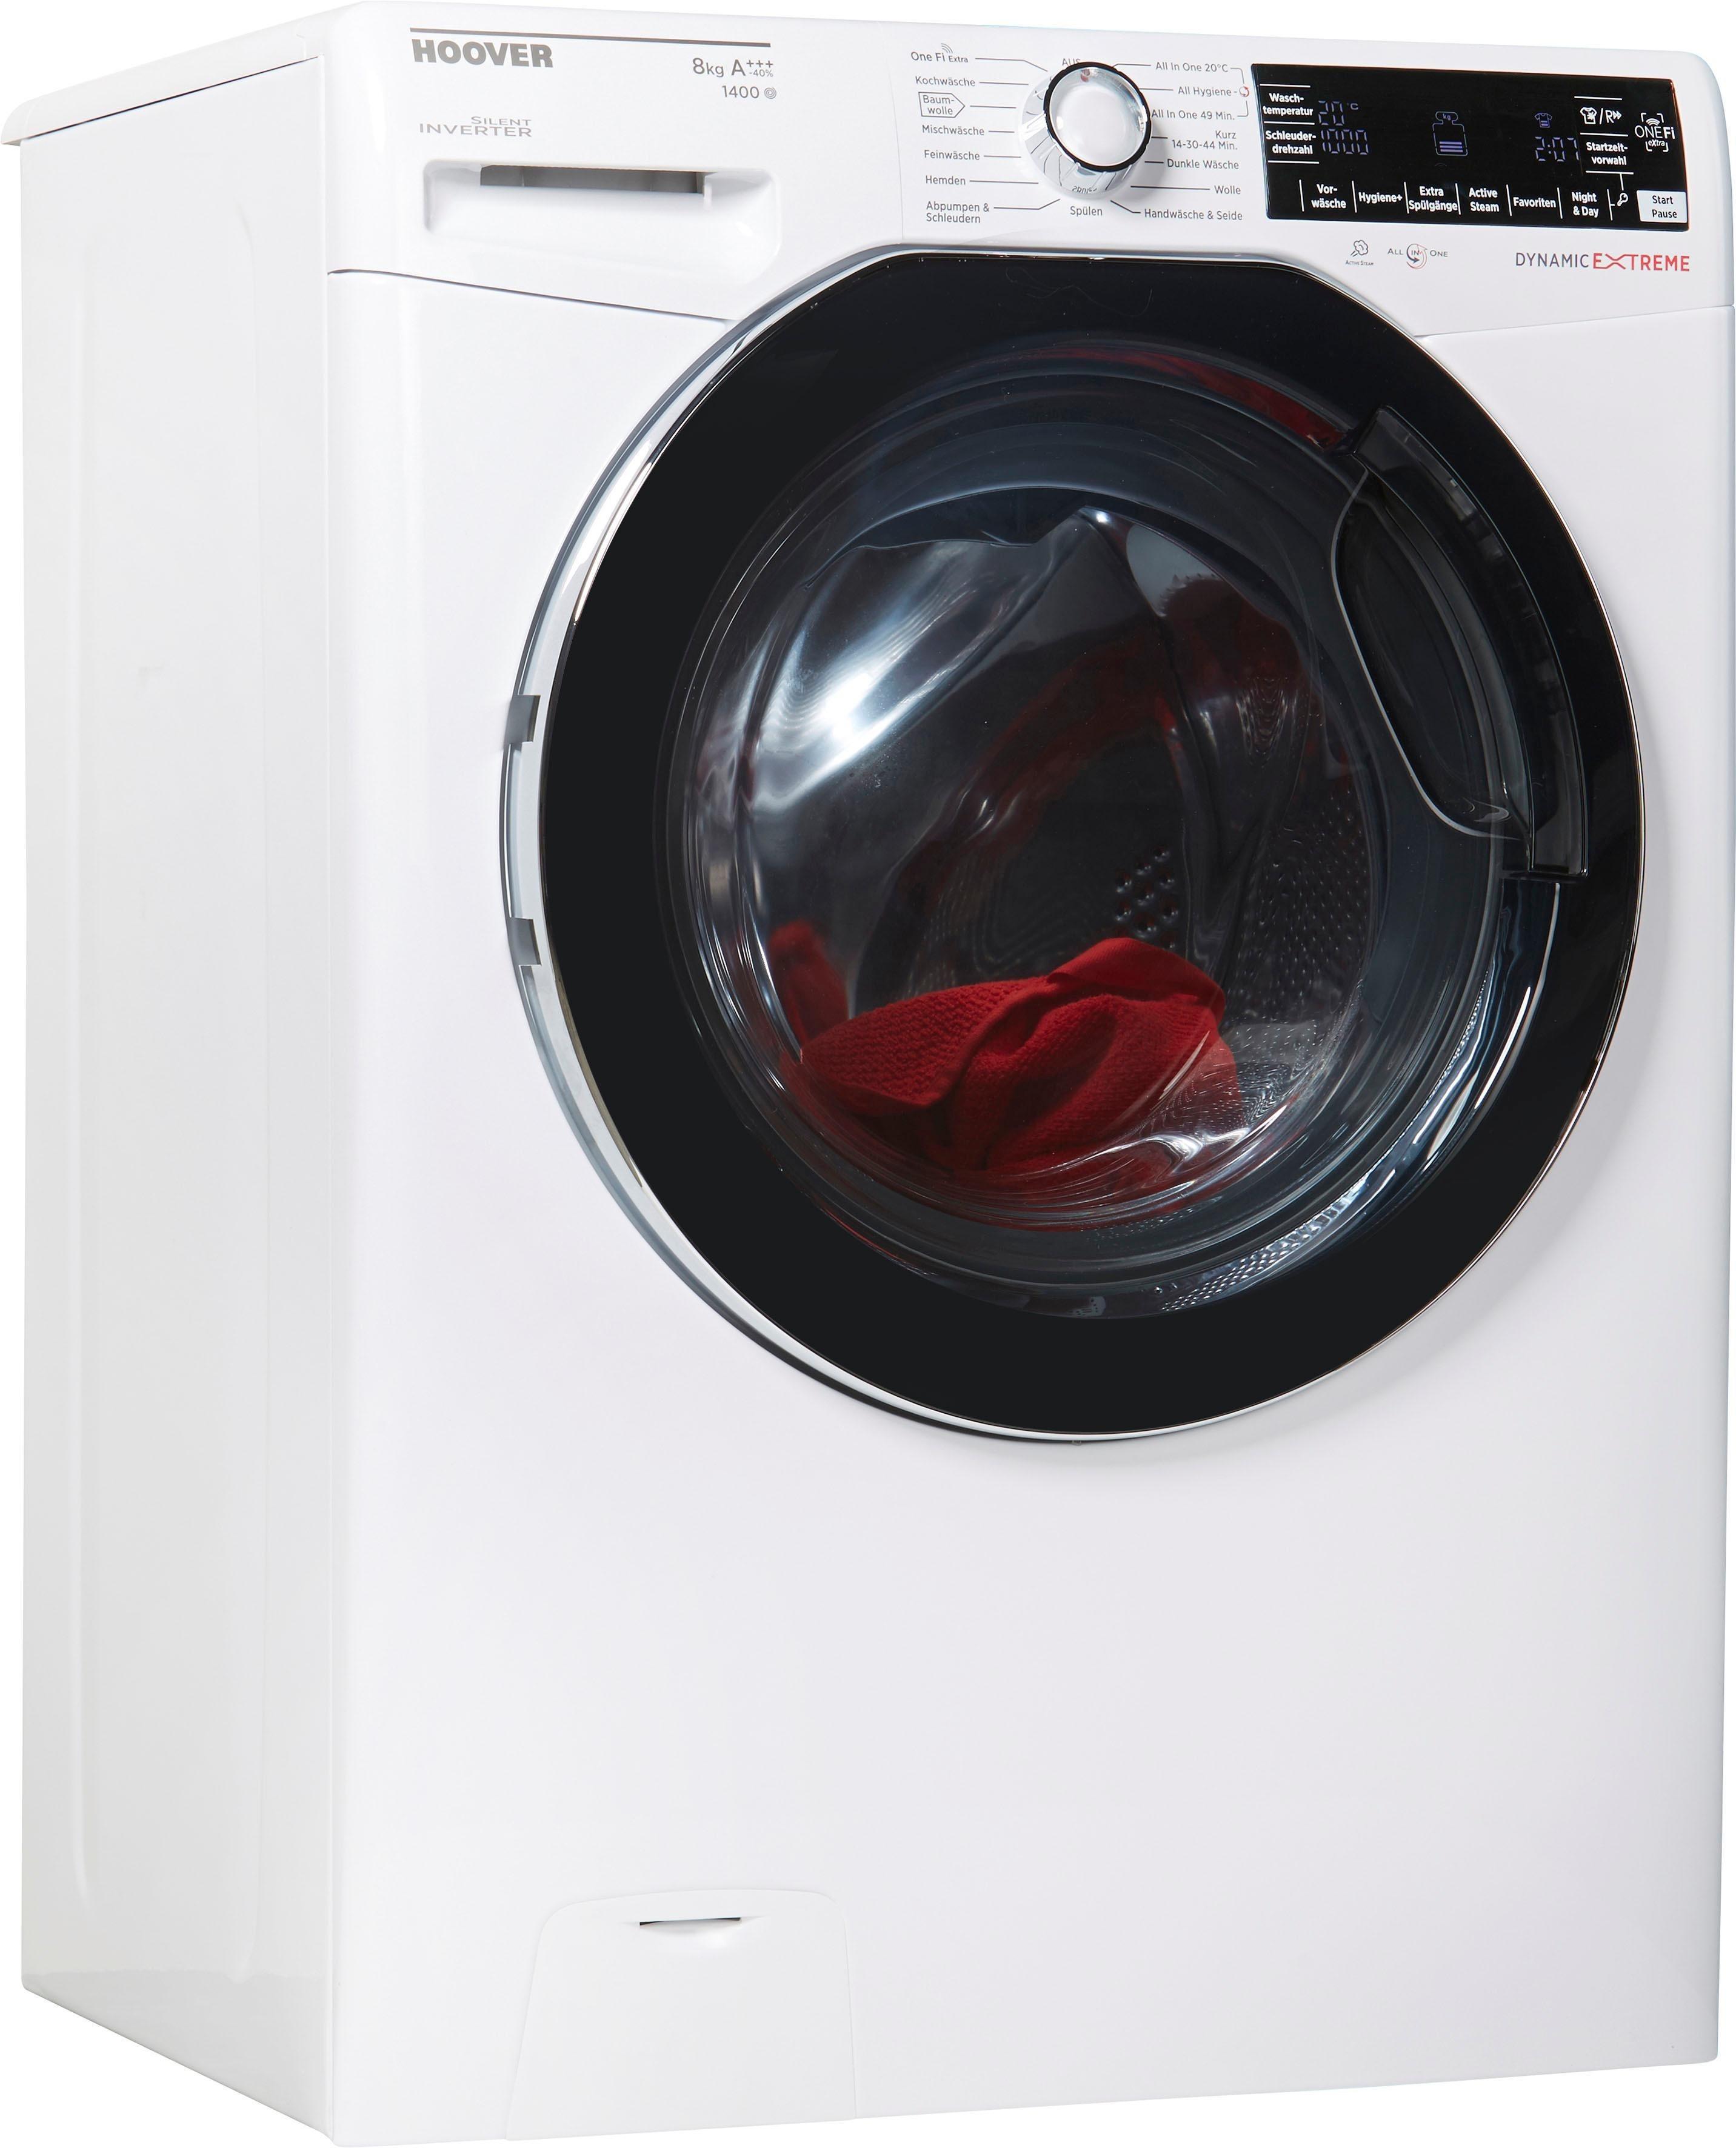 Hoover Waschmaschine Dynamic Extreme, 8 kg, 1400 U/Min